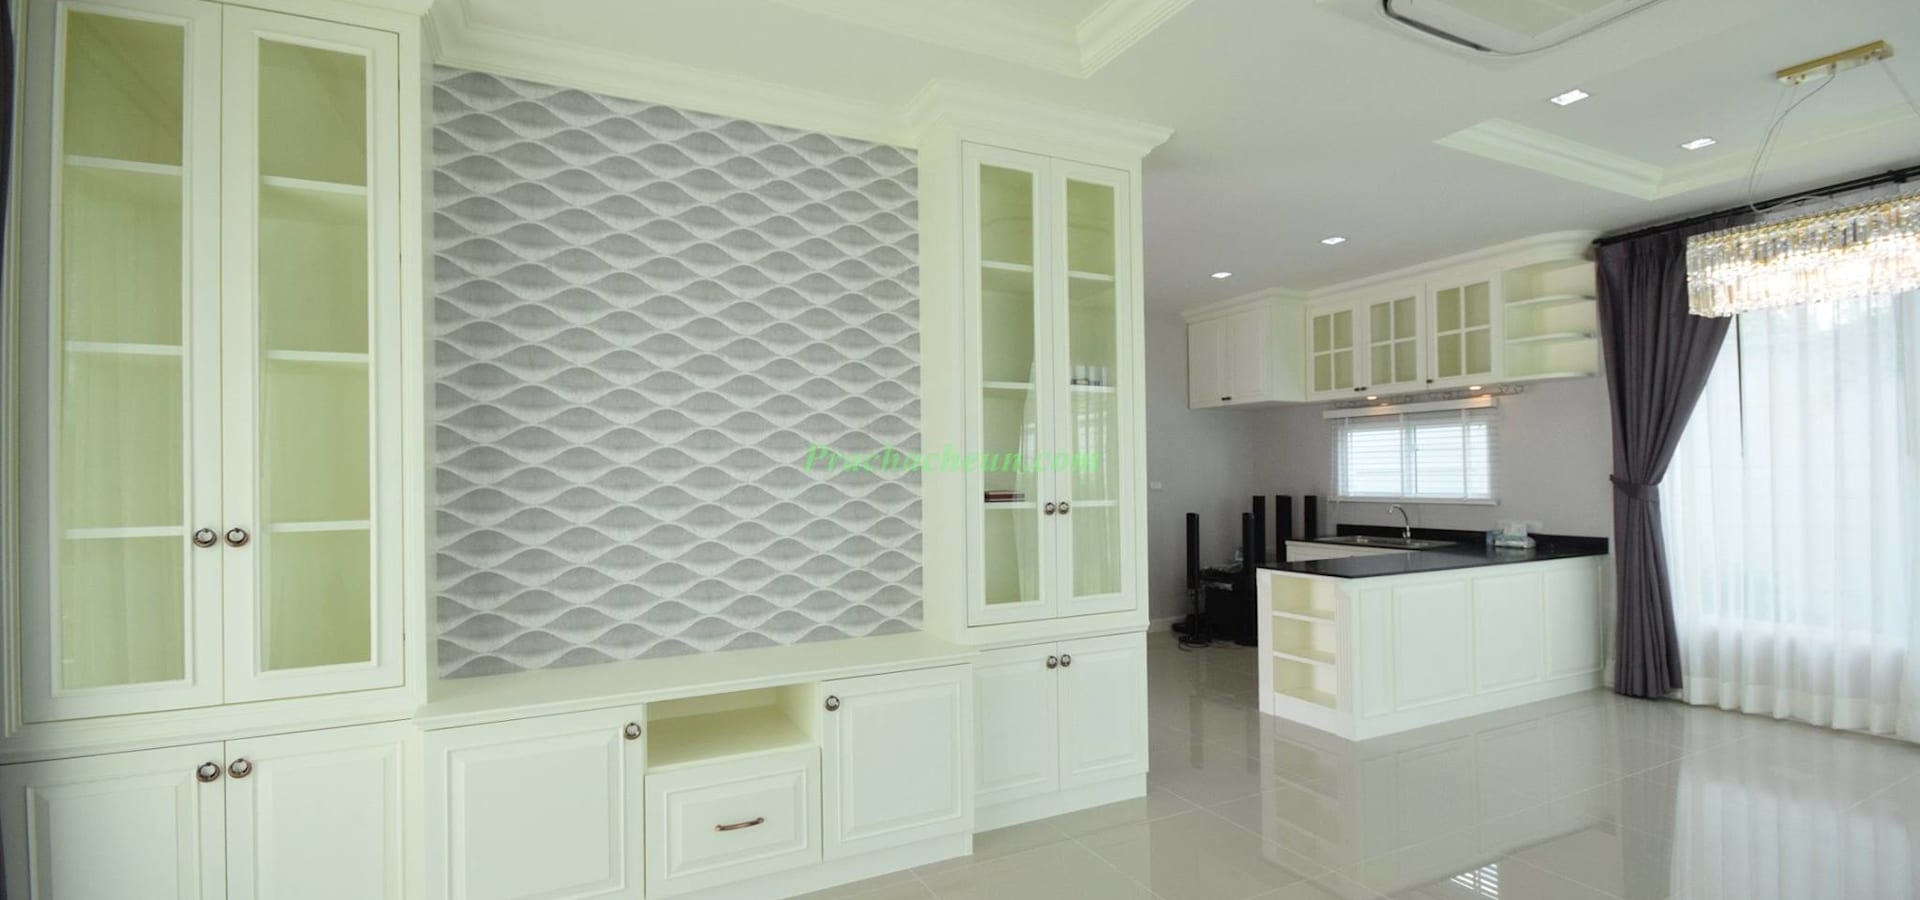 Prachacheun interior design built-in